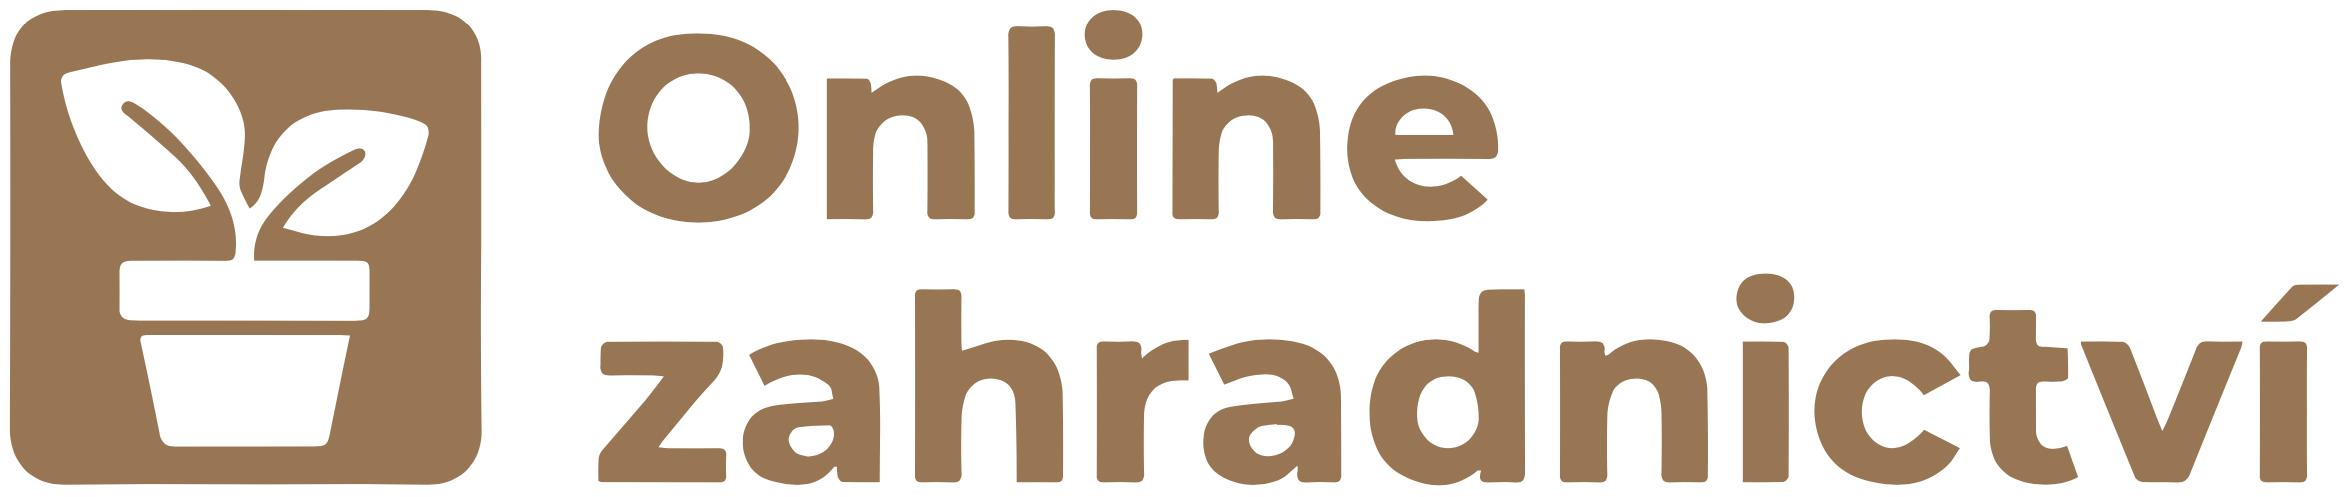 Onlinezahradnictvi.cz